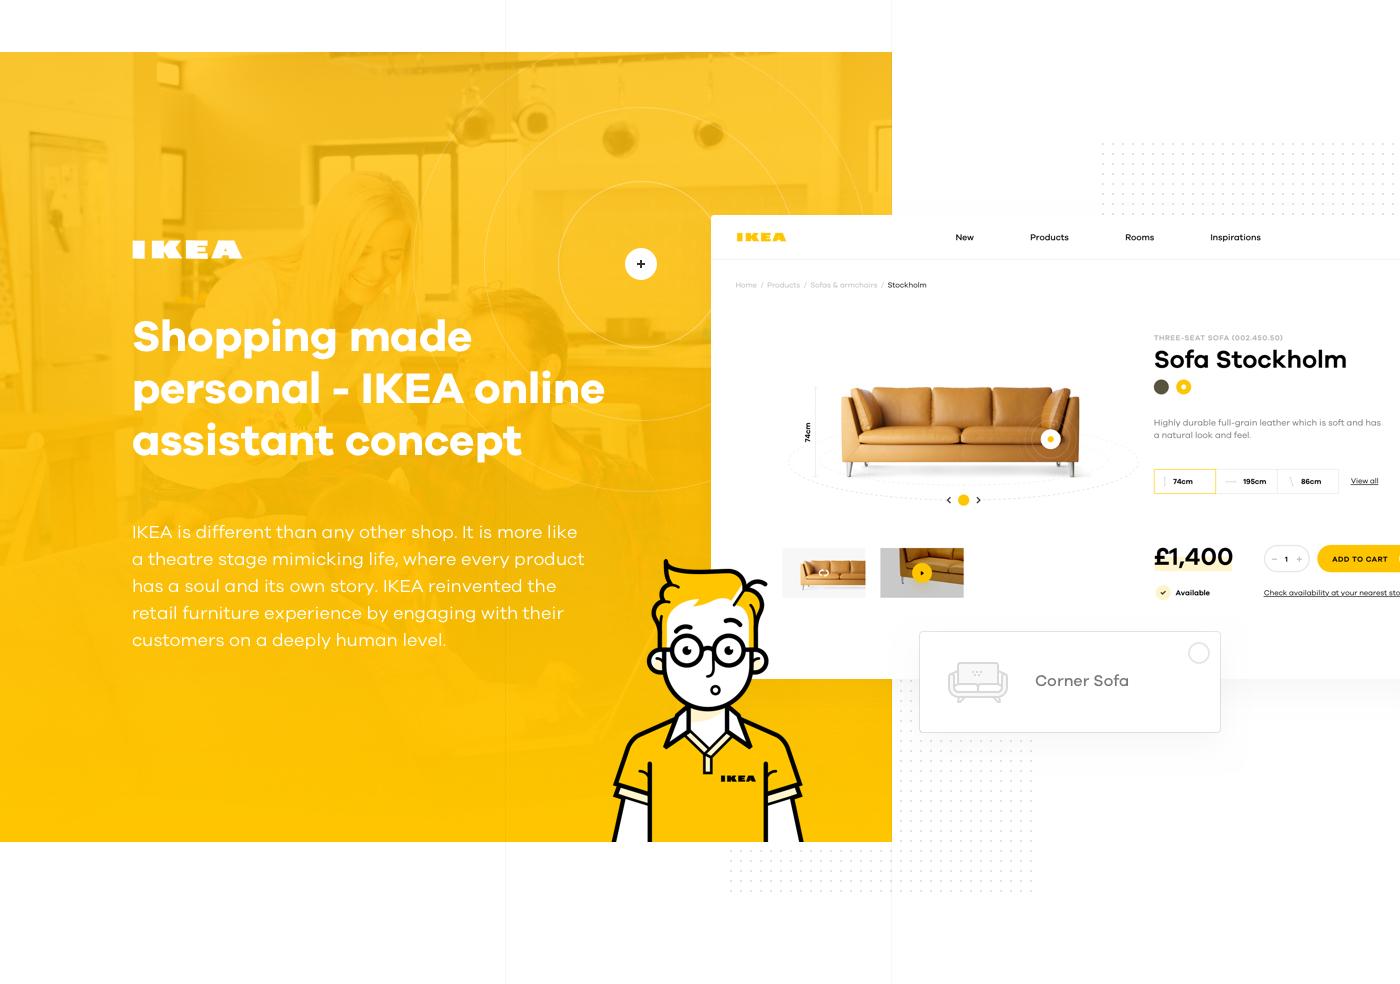 ikea shop online contact